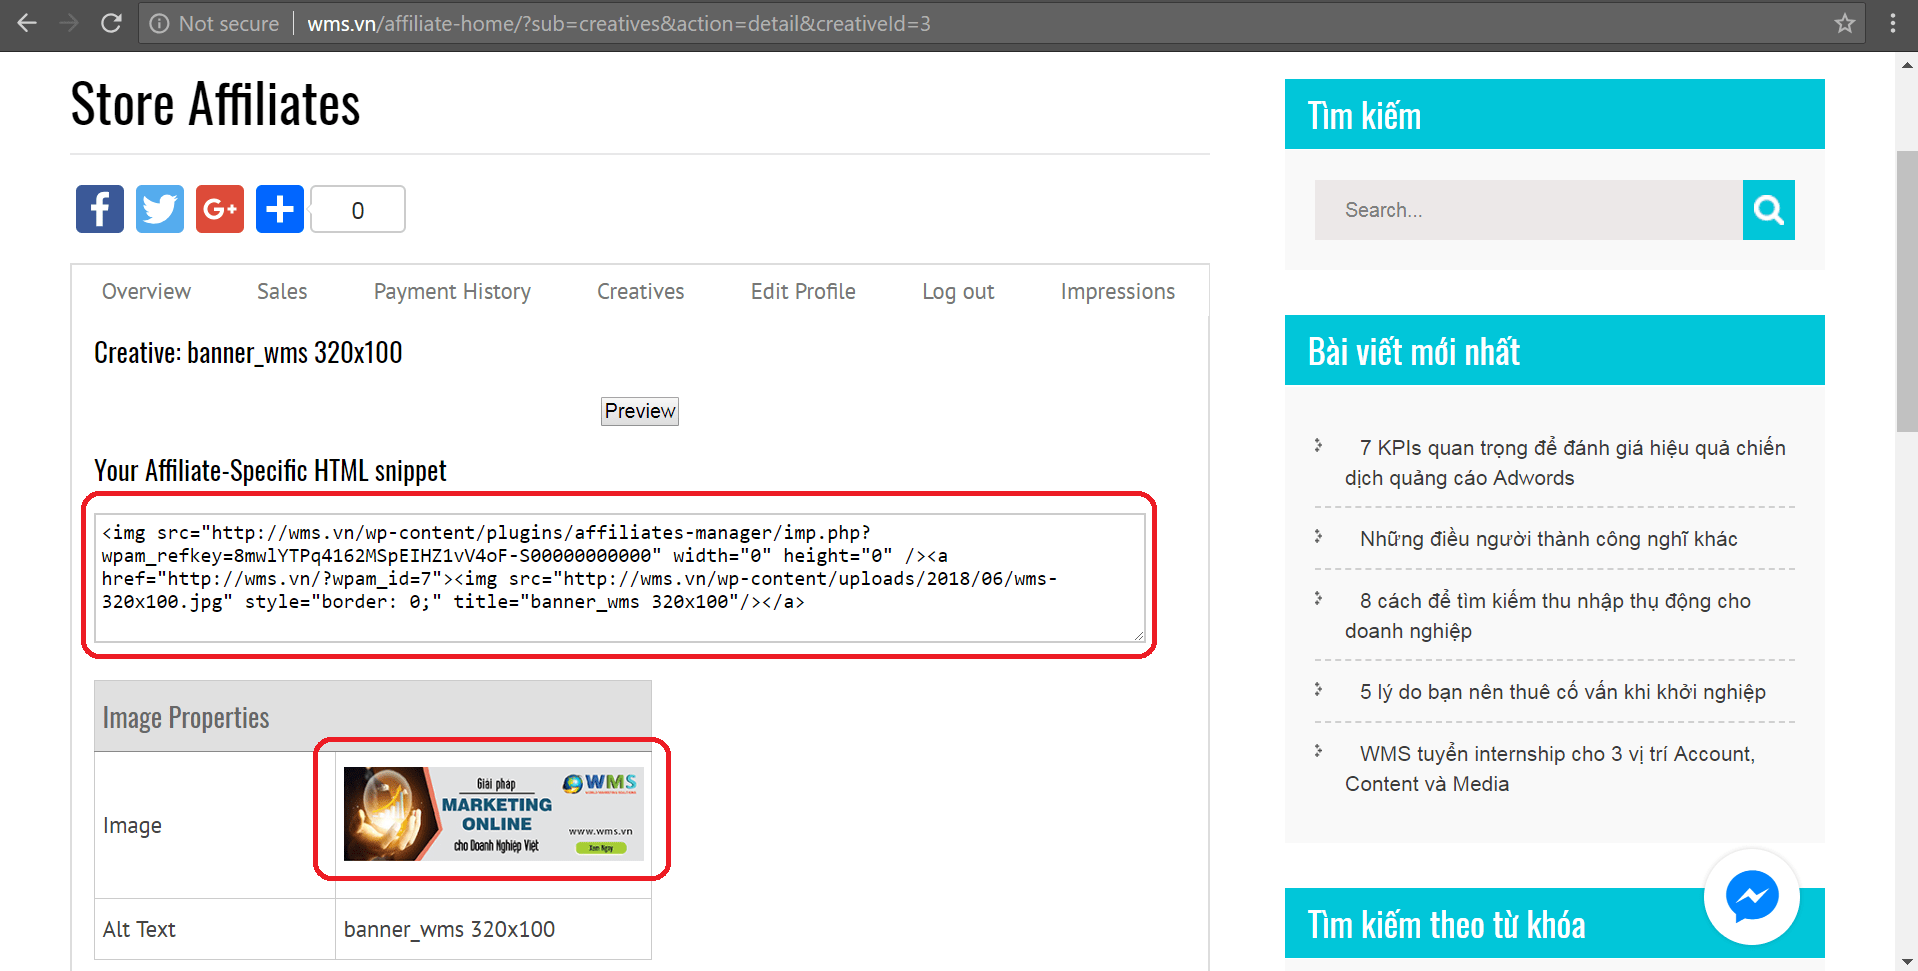 wms affiliate marketing